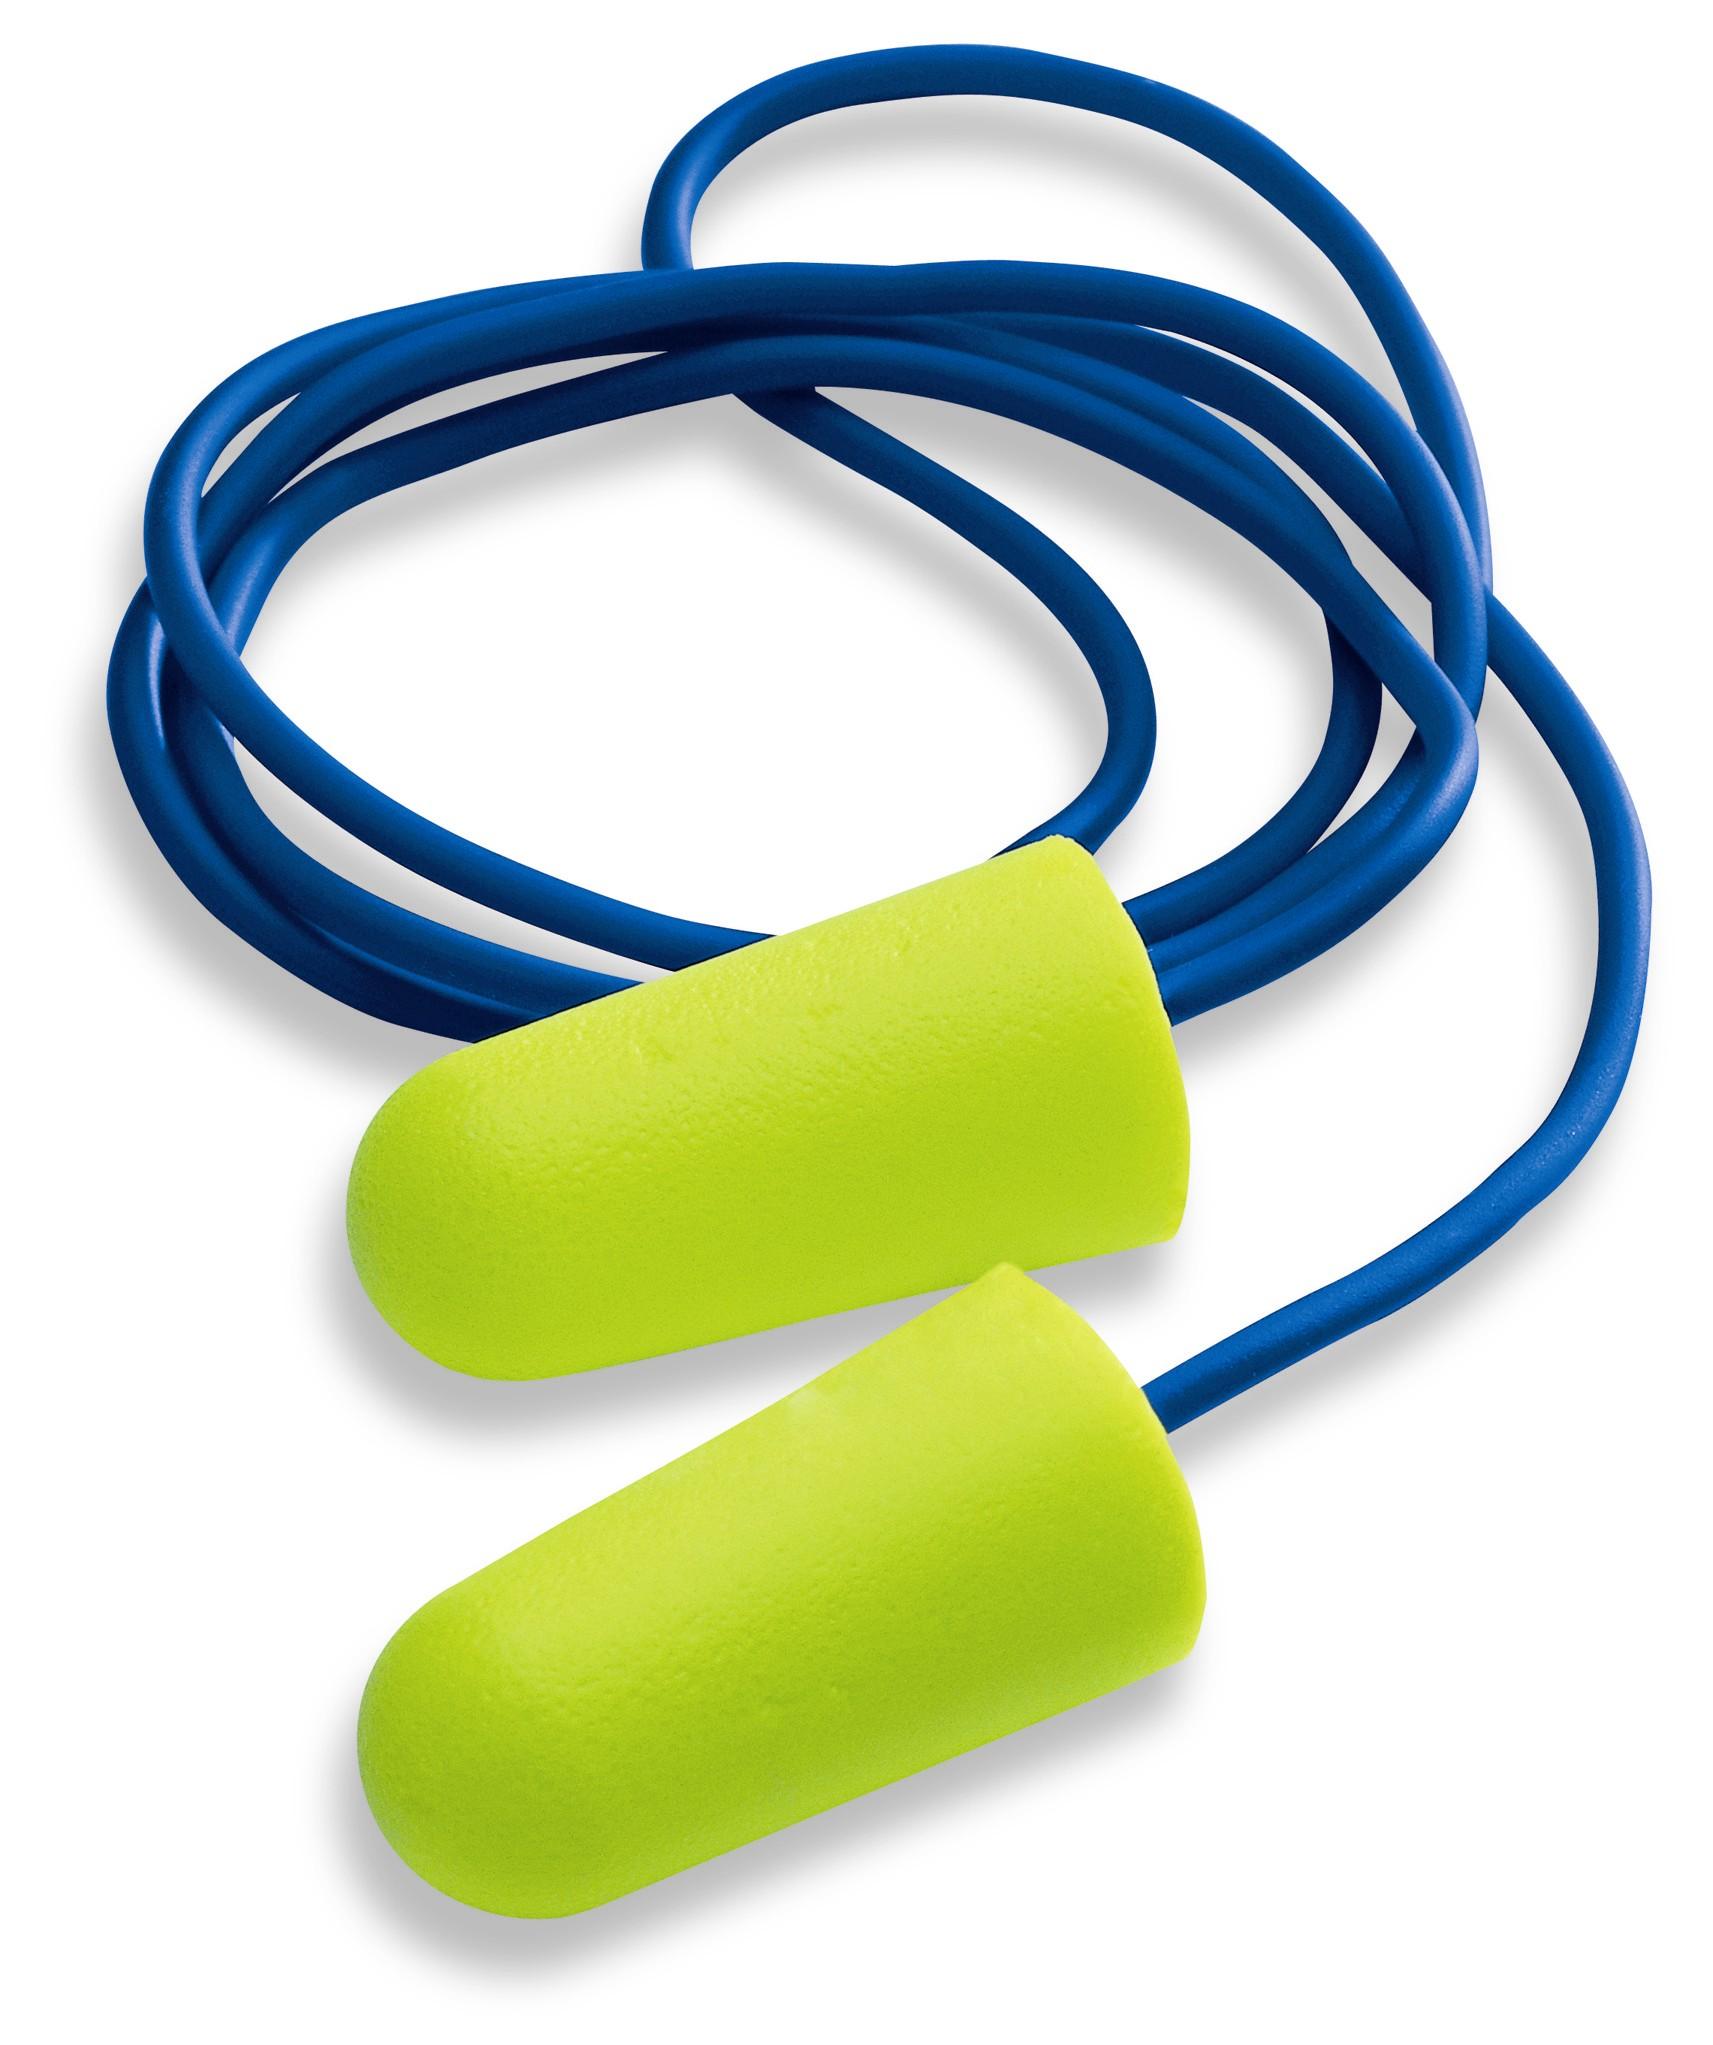 bodyguard-Ear-Plugs-Uvex-X-Fit-Corded-Earplugs-(Packed-100-pairs)